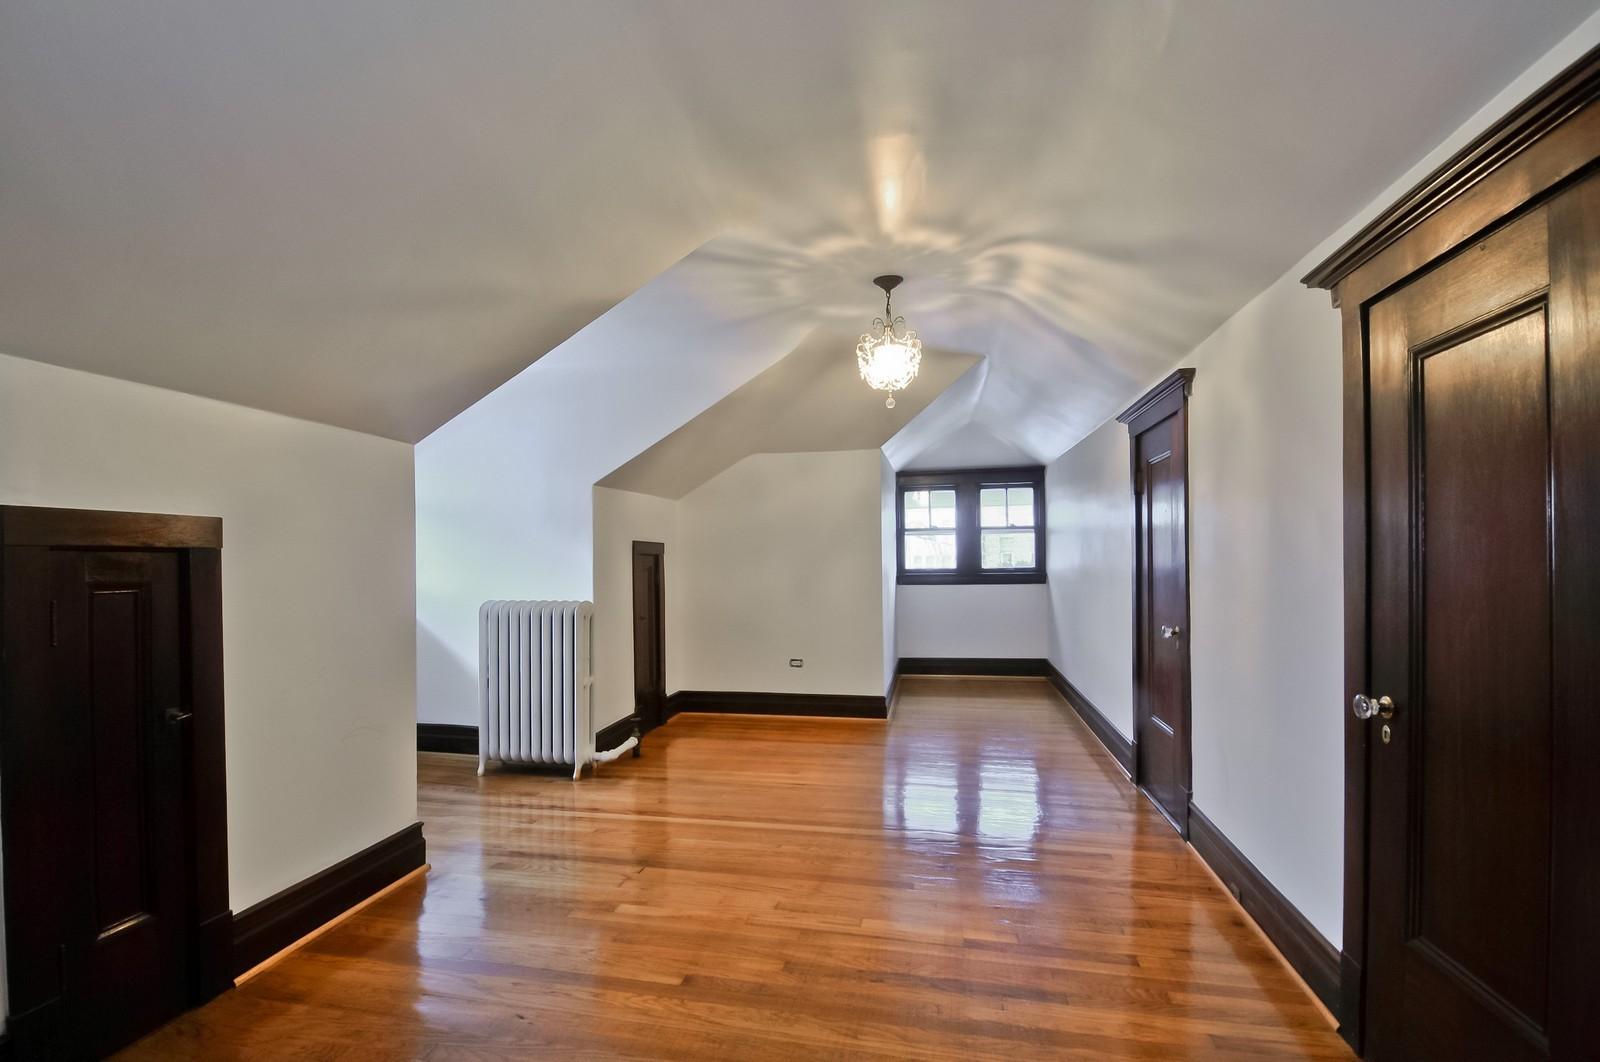 Real Estate Photography - 2226 W Pratt, Chicago, IL, 60645 - Location 1